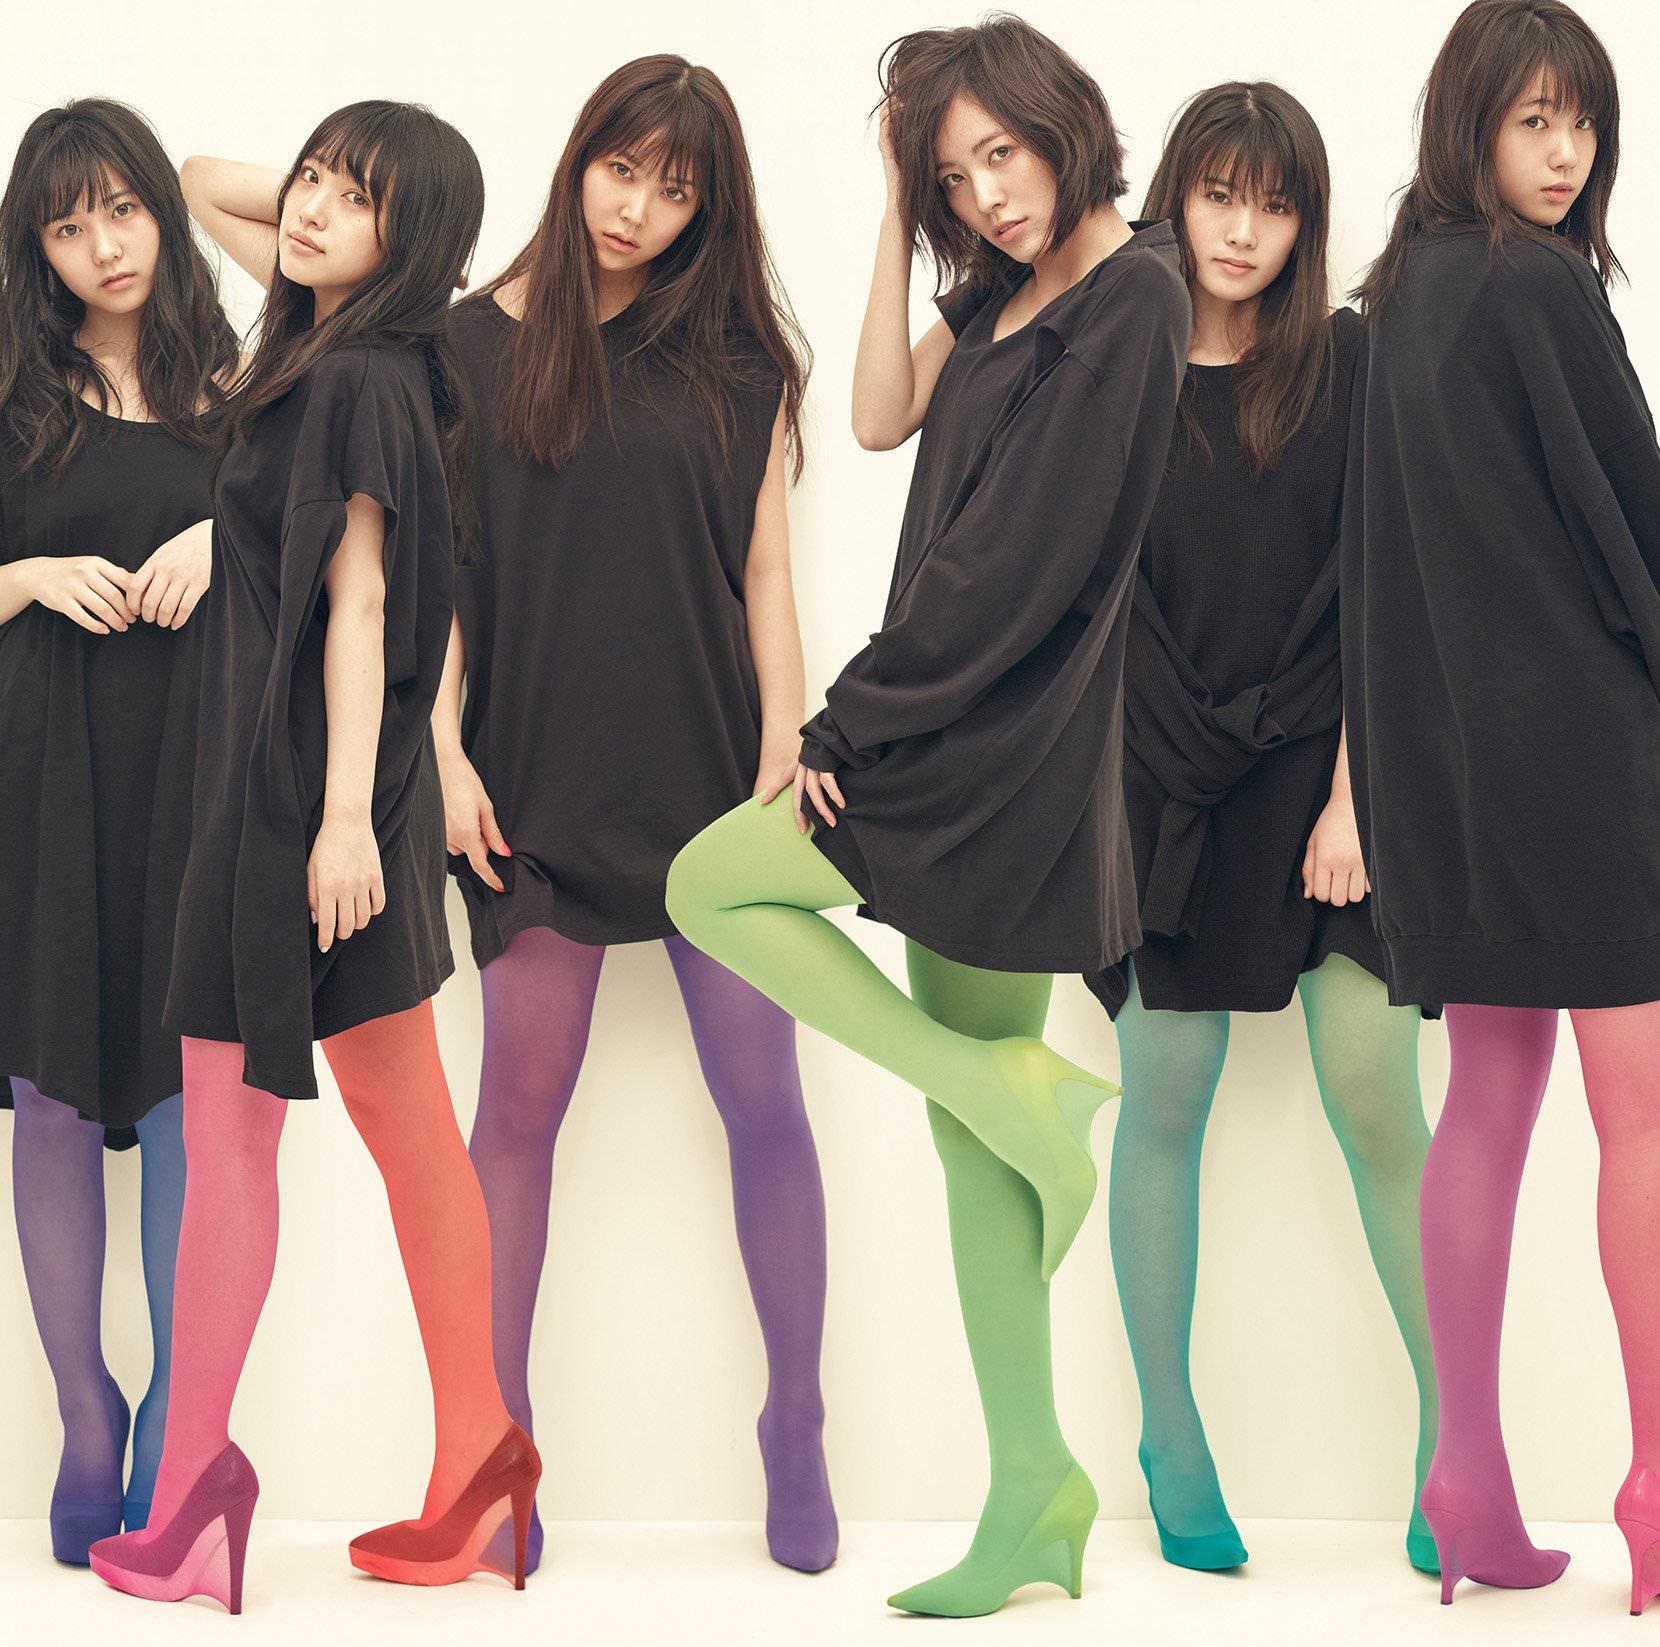 20171130.0608.09 AKB48 - 11gatsu no Anklet (Type E) cover 09.jpg